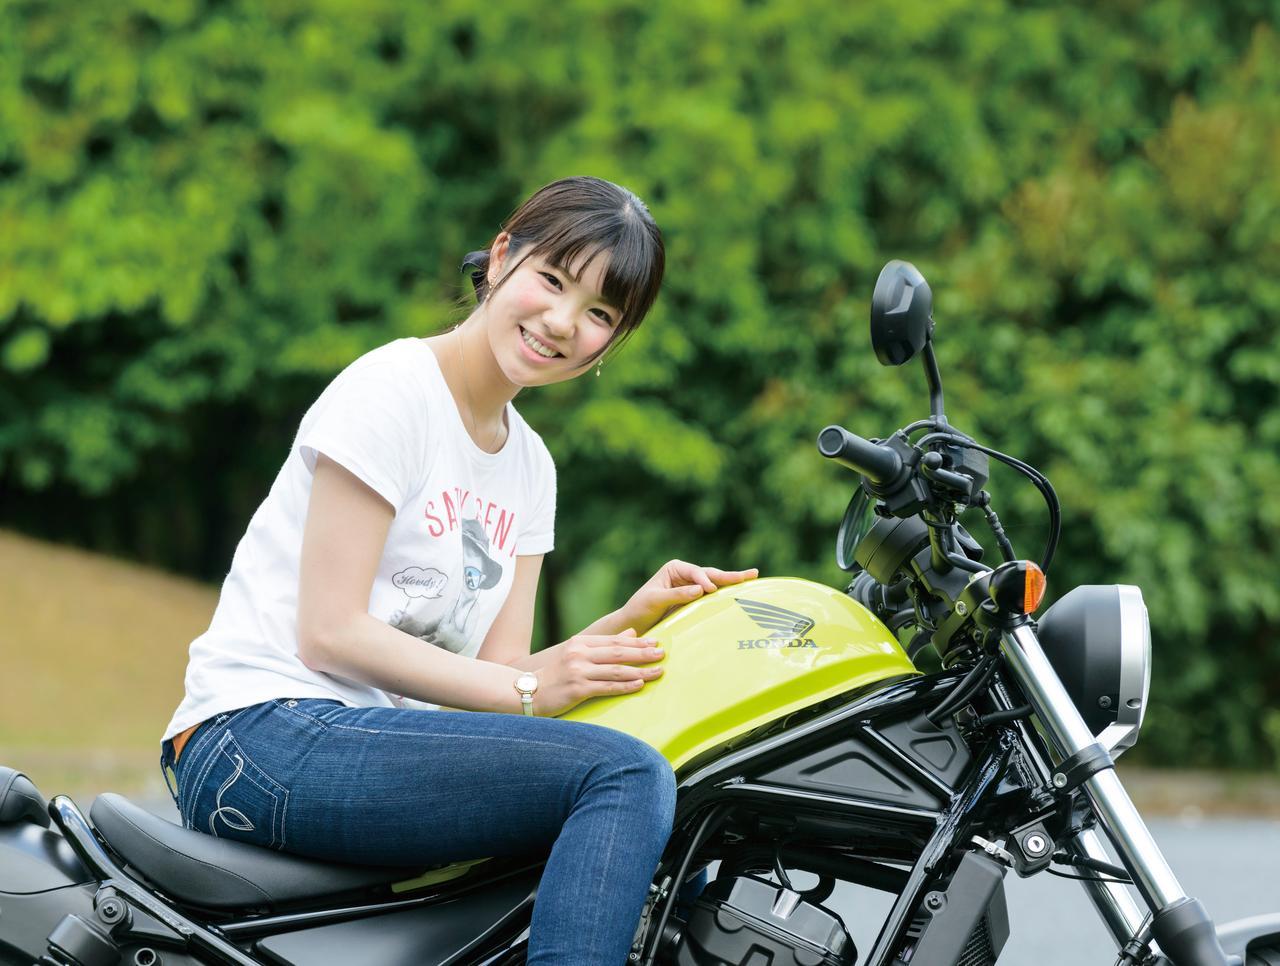 honda 250 japan bike of the year 2017 web. Black Bedroom Furniture Sets. Home Design Ideas